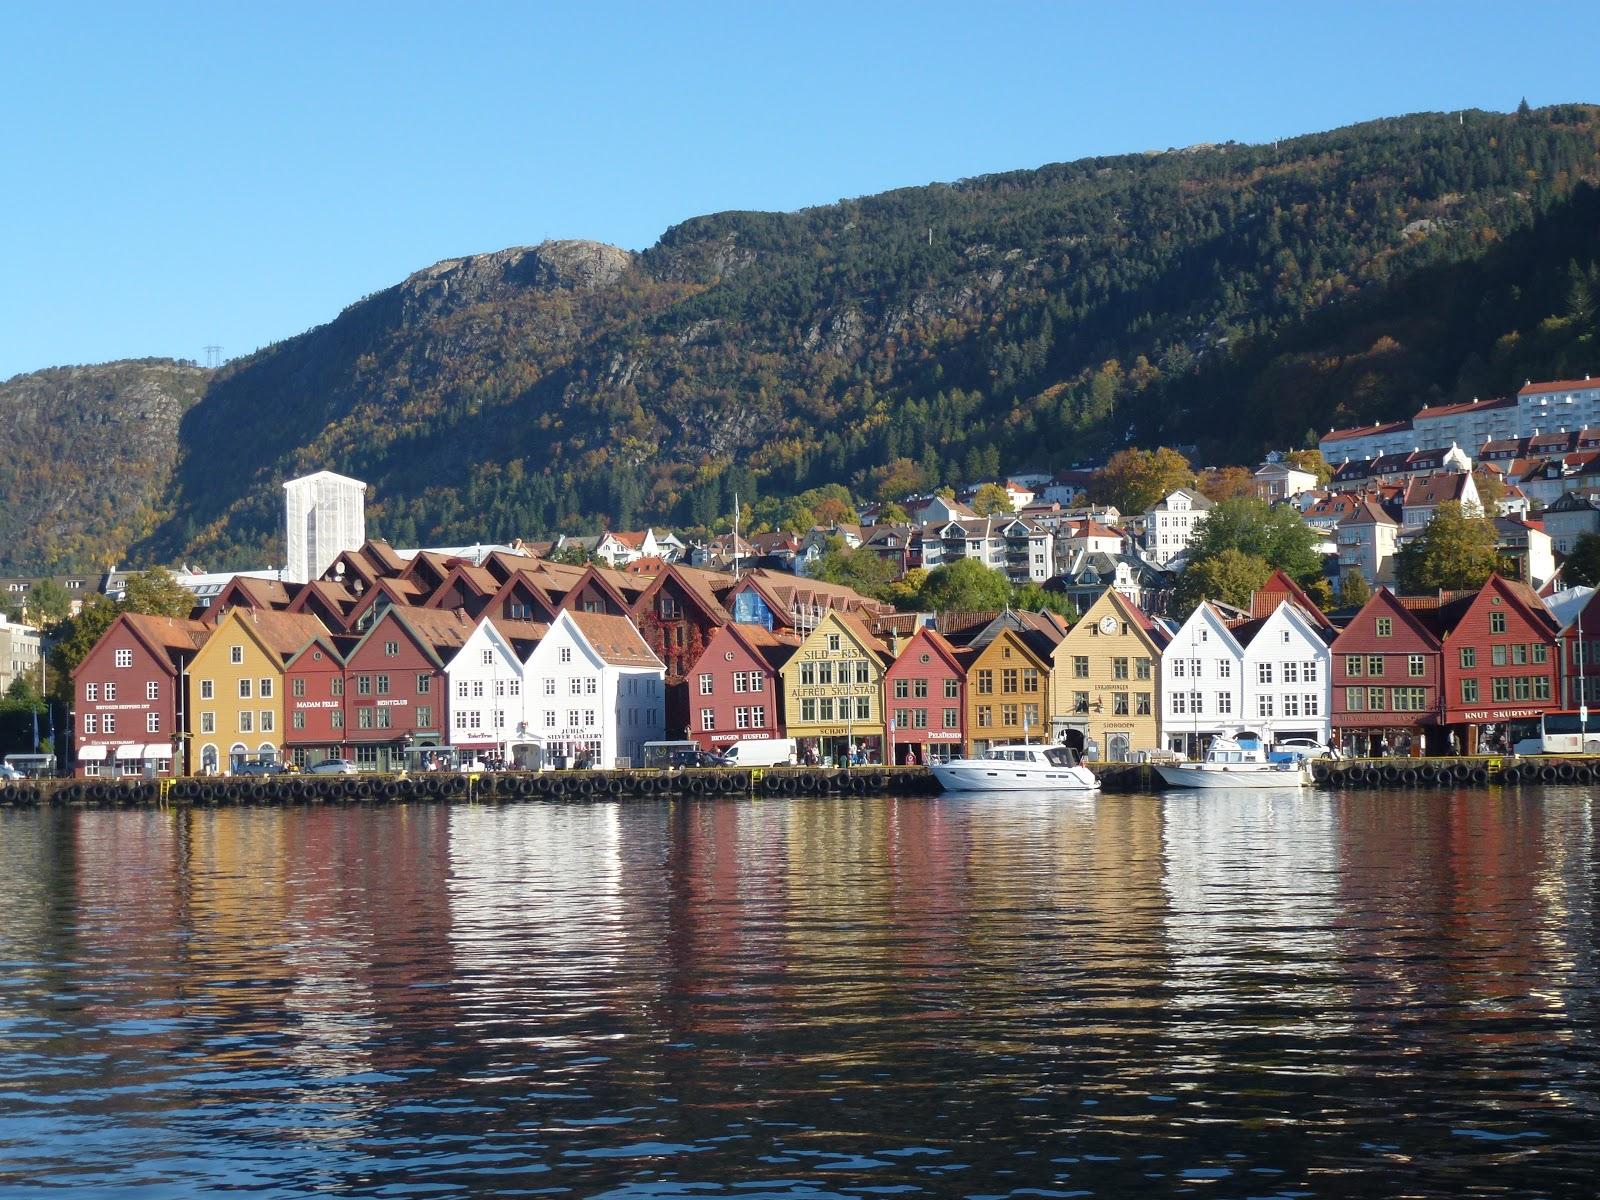 norsk amatørx hvor ligger livmoren